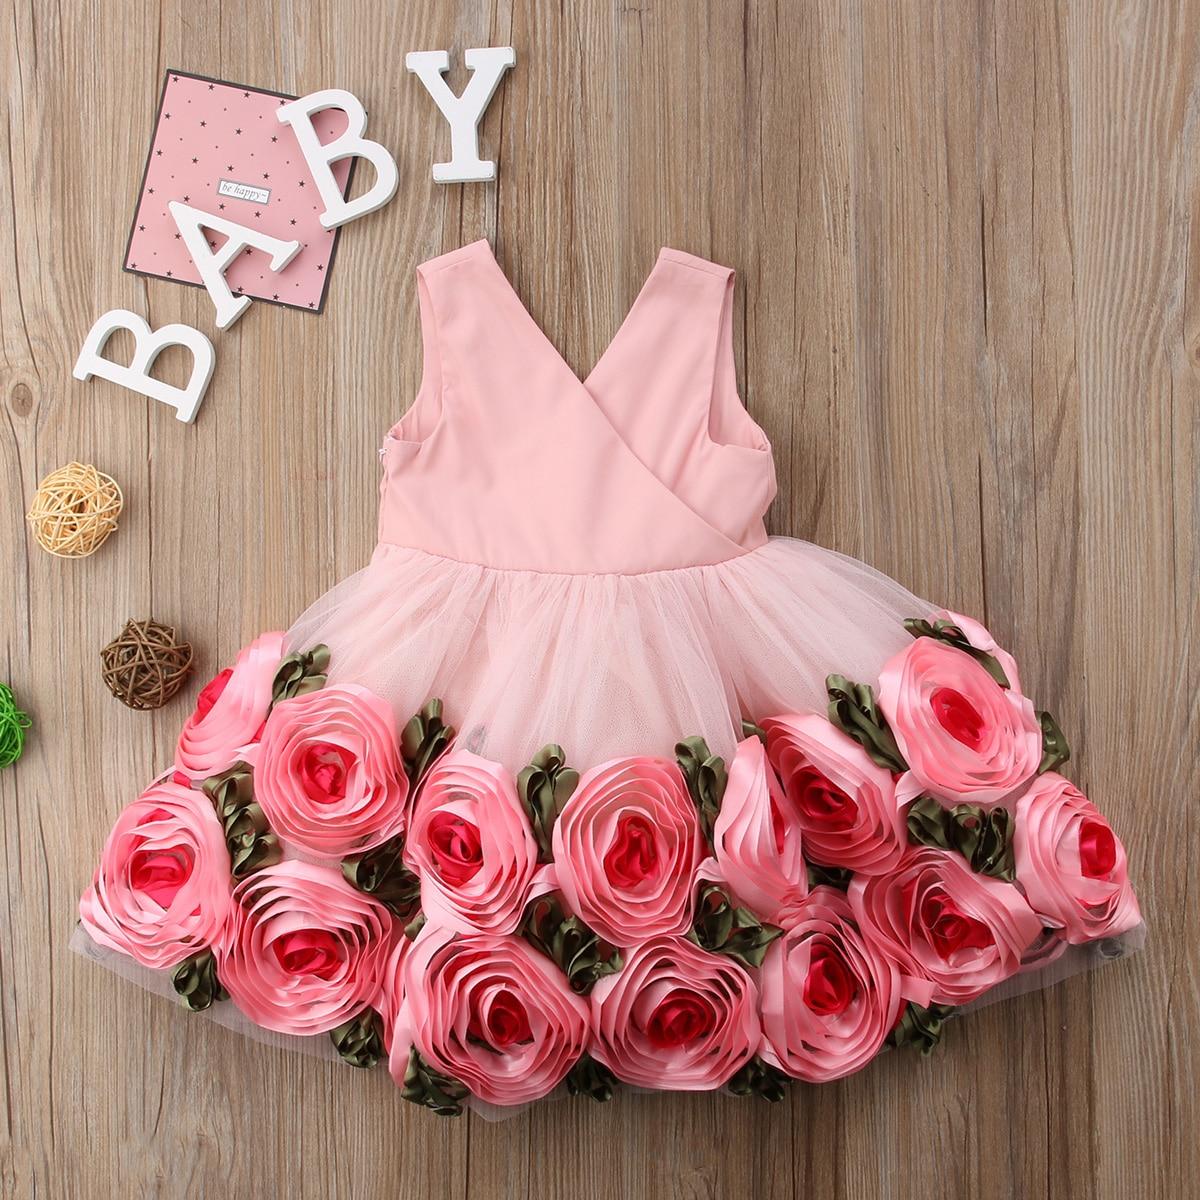 Girls Floral Romper Rose Clothes Baby Clothes Roses Roses Baby Clothes 2019 Girl Baby Clothes Rose Baby Newborn Tutu Newborn Infant Baby Girls 3D Rose Romper Back